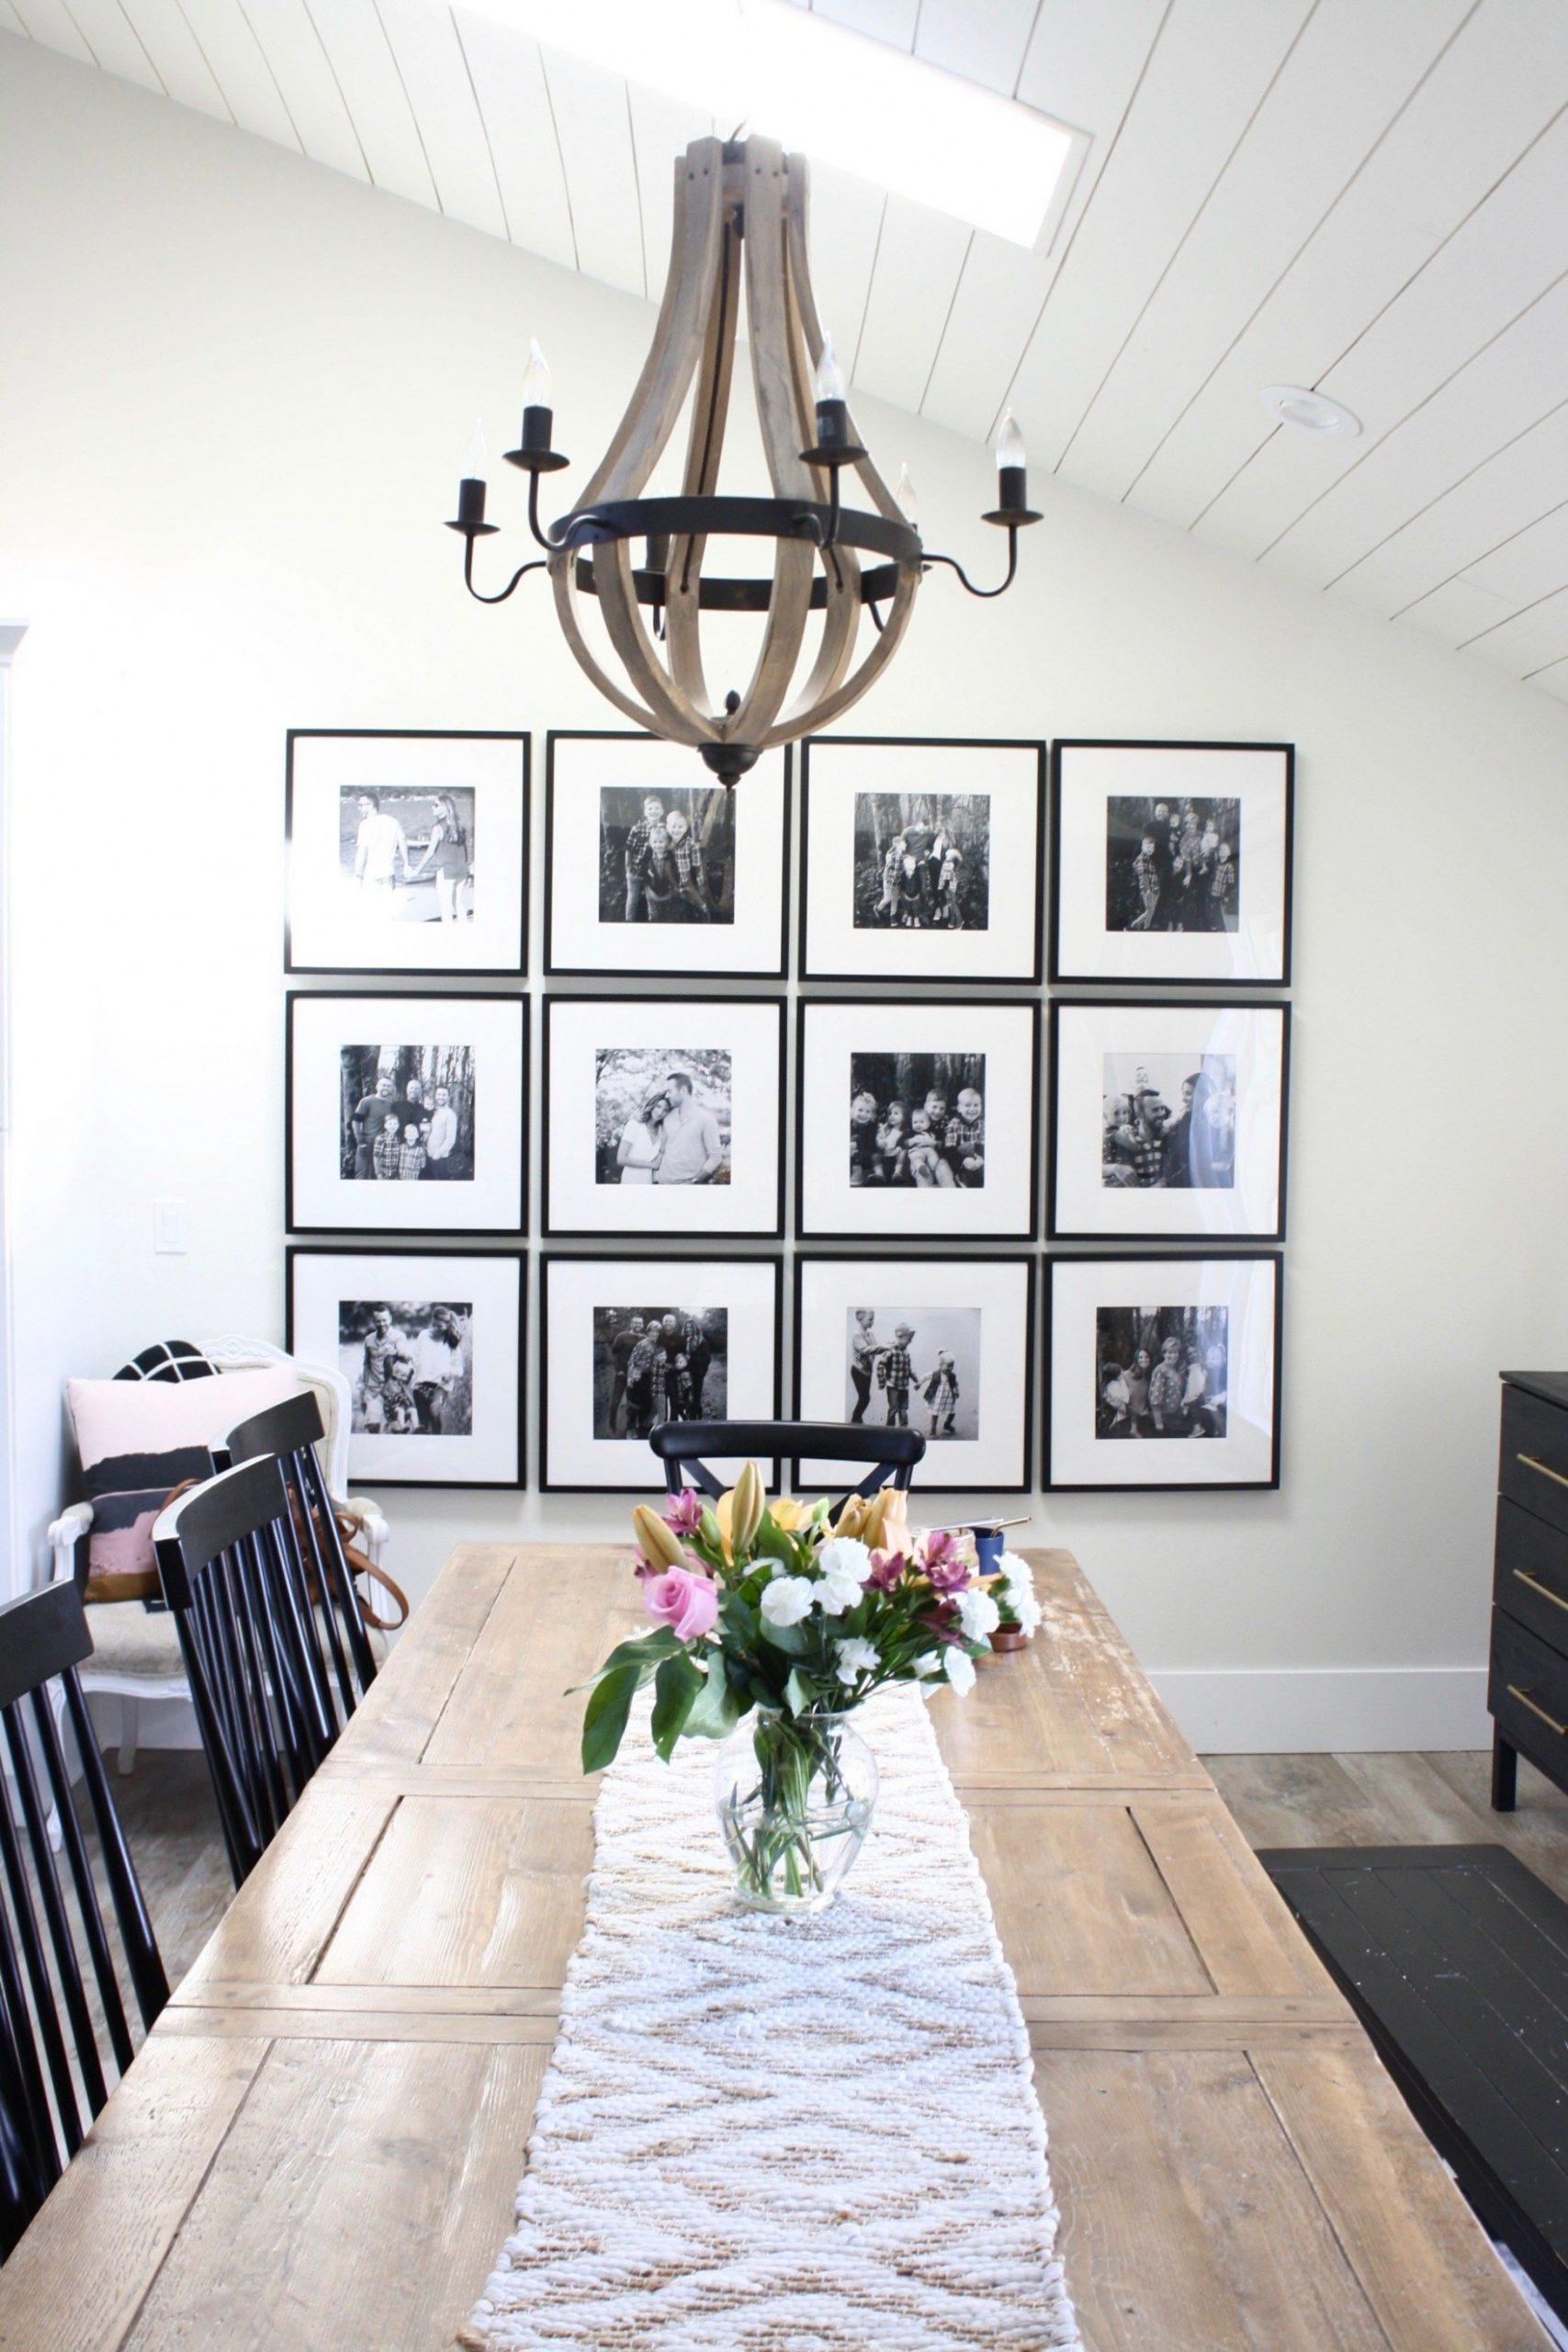 IKEA Gallery Wall in a modern farmhouse dining room  Dining room  - Dining Room Ideas Gallery